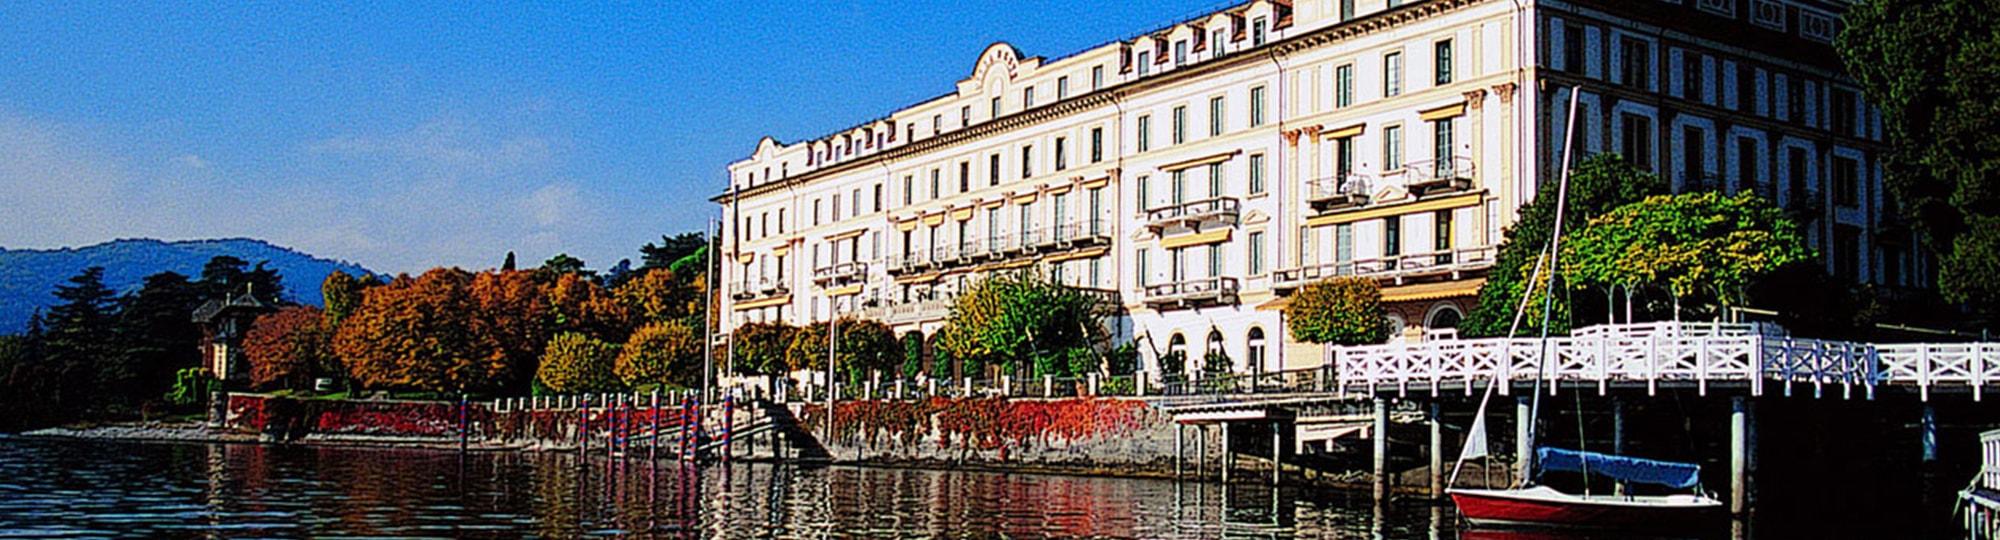 Vue de l'hotel Villa d'Este 5 * à Cernobbio